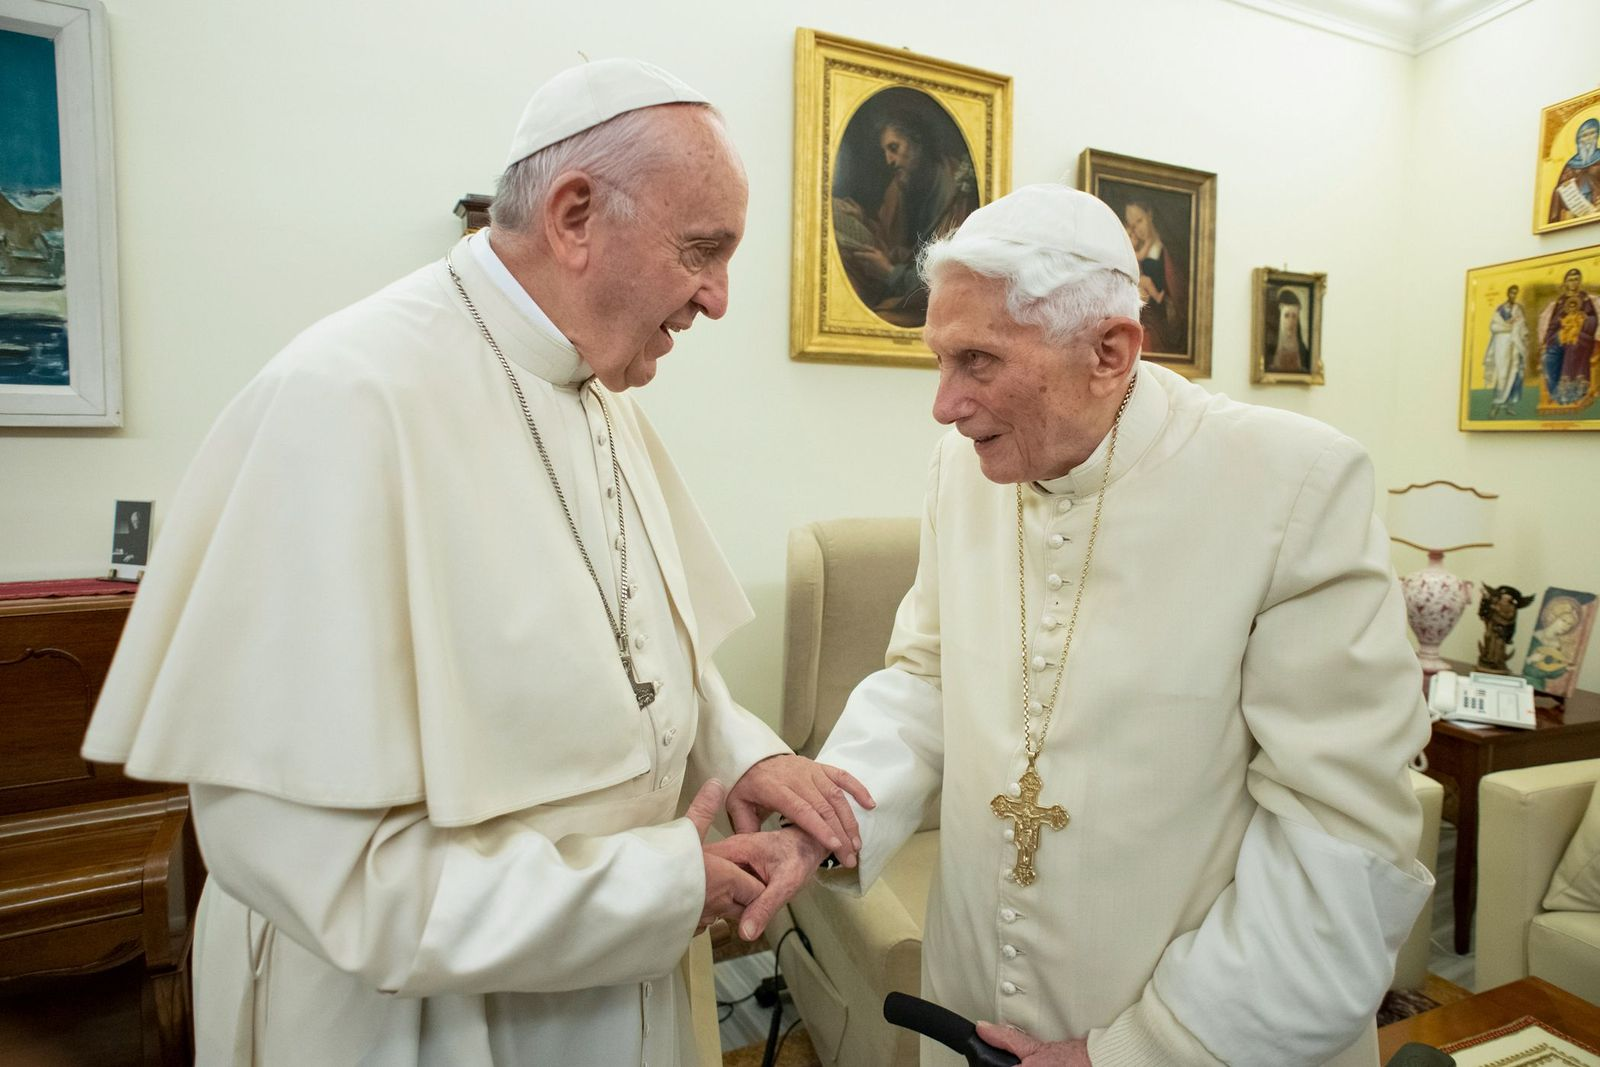 FILES-VATICAN-POPE